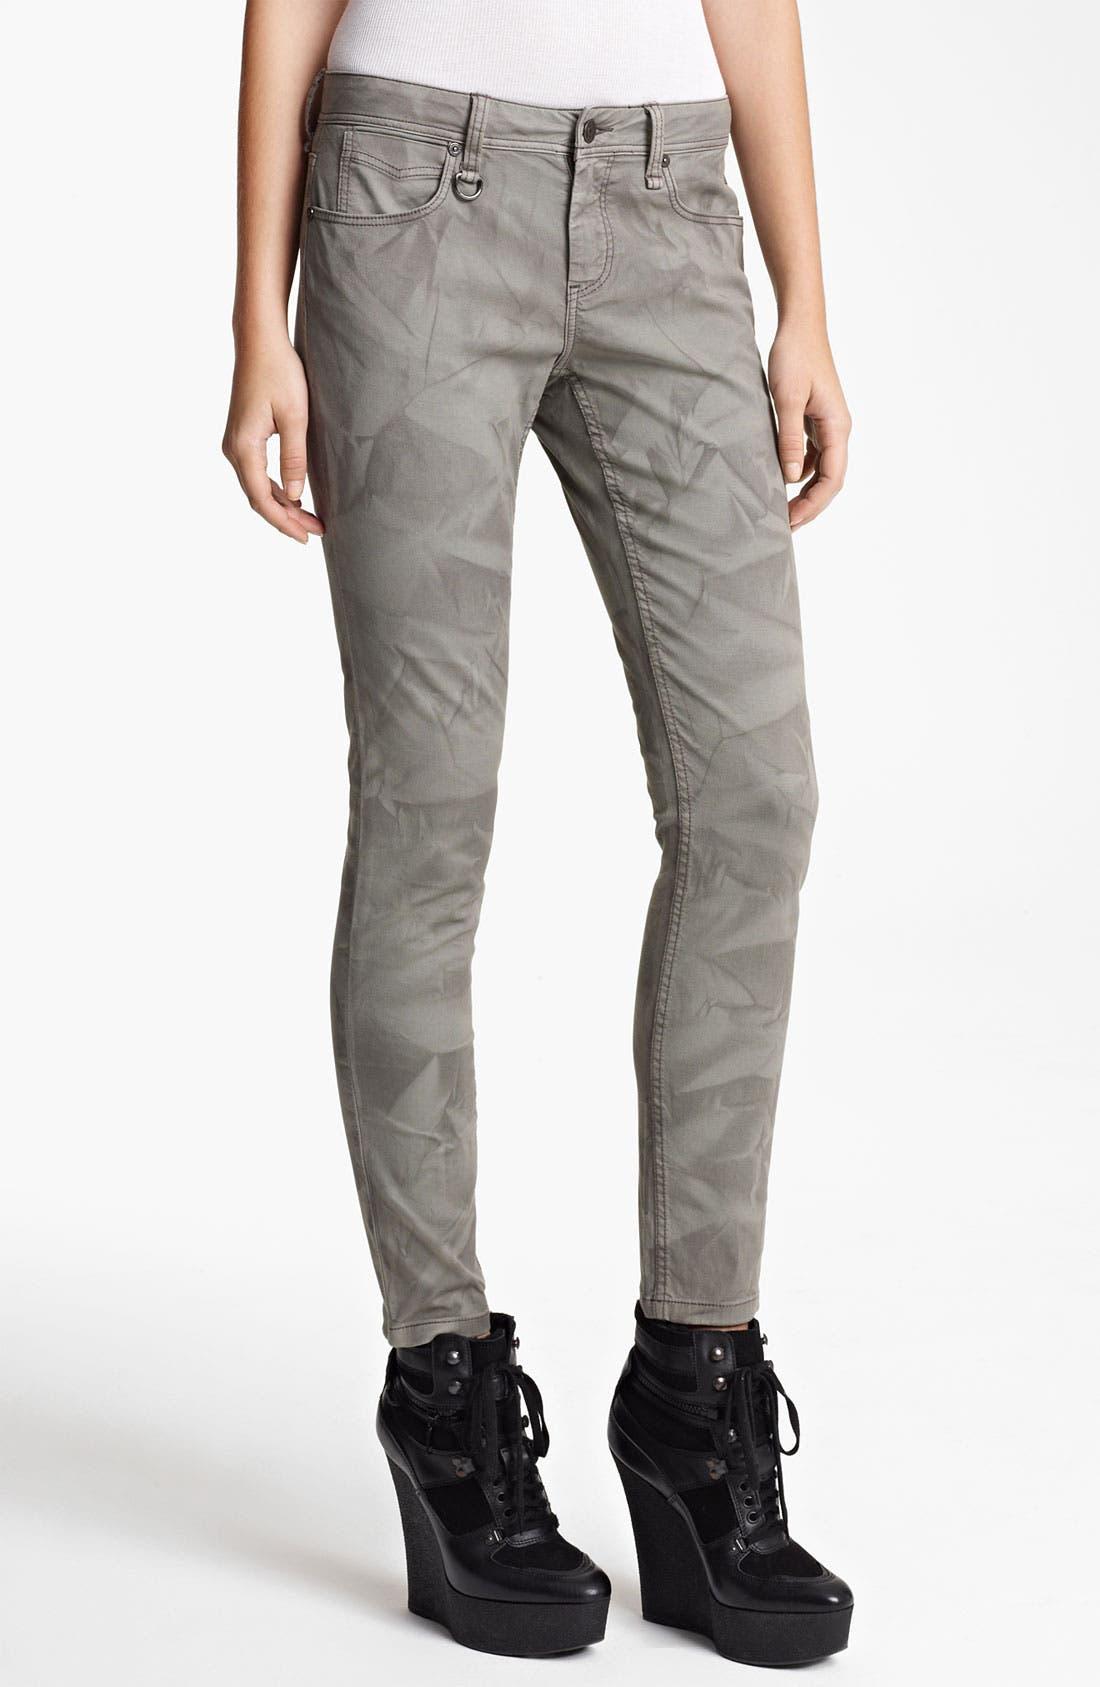 Alternate Image 1 Selected - Burberry Brit Crumple Dye Pants (Online Exclusive)